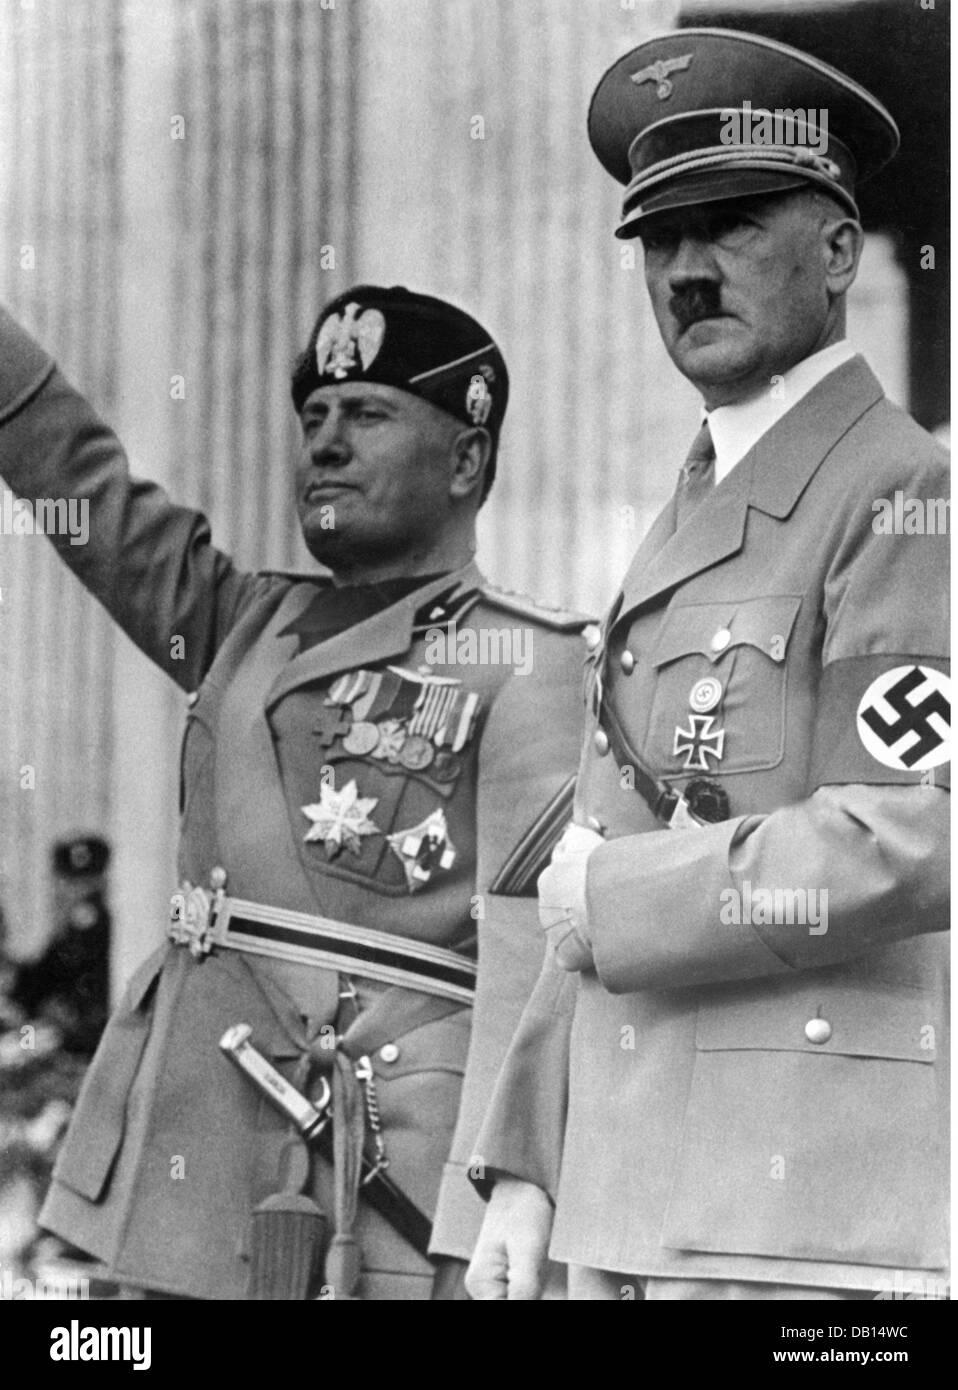 Mussolini, Benito, 29.7.1883 - 28.4.1945, italienischer Politiker (PNF), Premierminister 30.10.1922 - 25.7.1943, Stockfoto